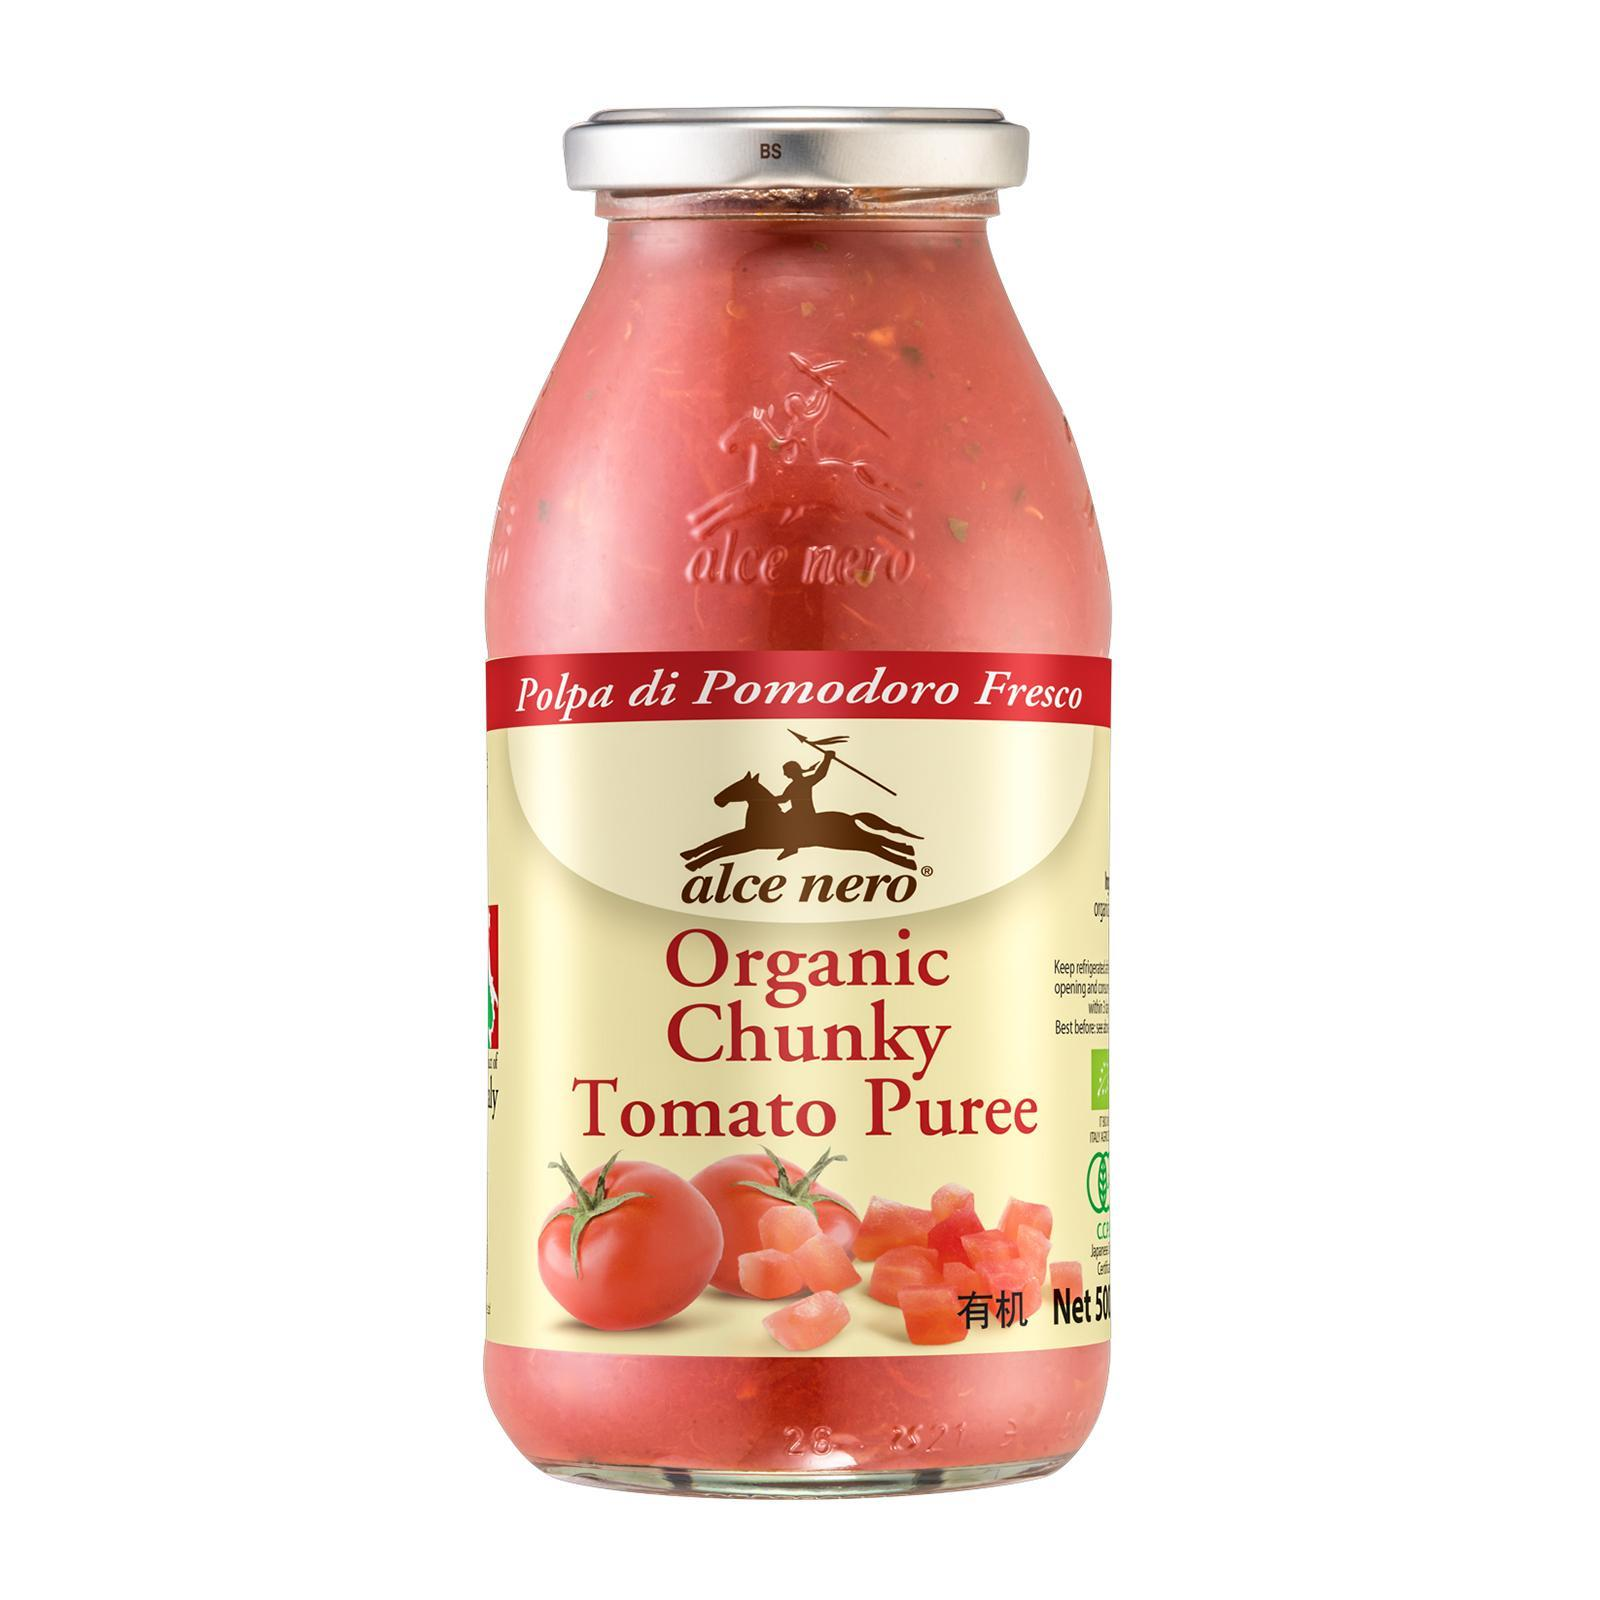 ALCE NERO Organic Chunky Tomato Puree 500g